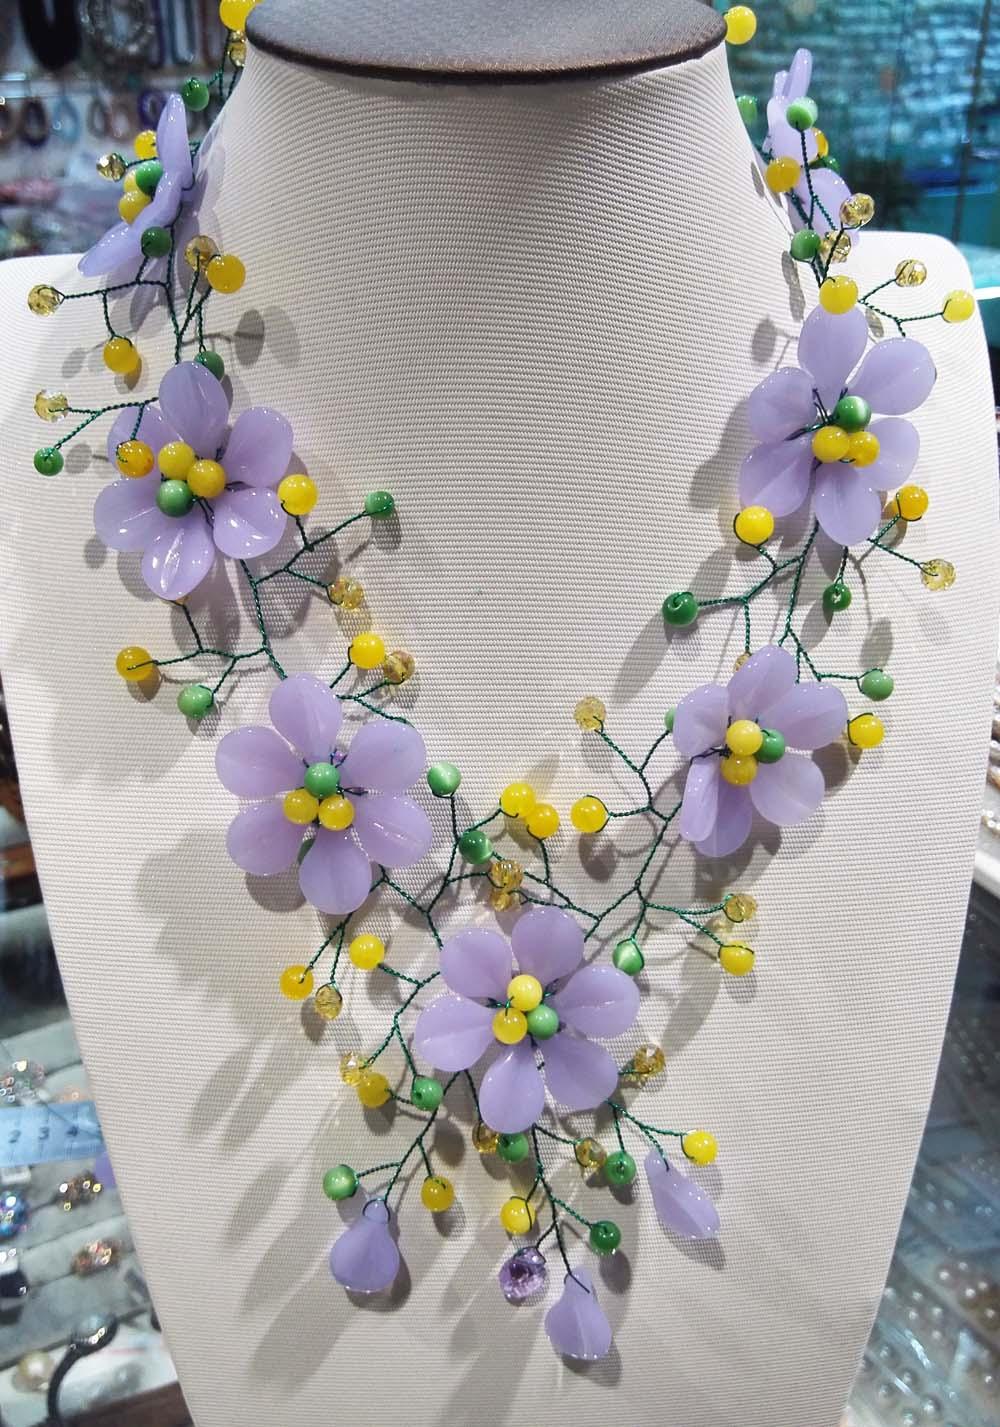 purple stone flower jades  beads necklace  19inch weholesale beads gift  FPPJpurple stone flower jades  beads necklace  19inch weholesale beads gift  FPPJ